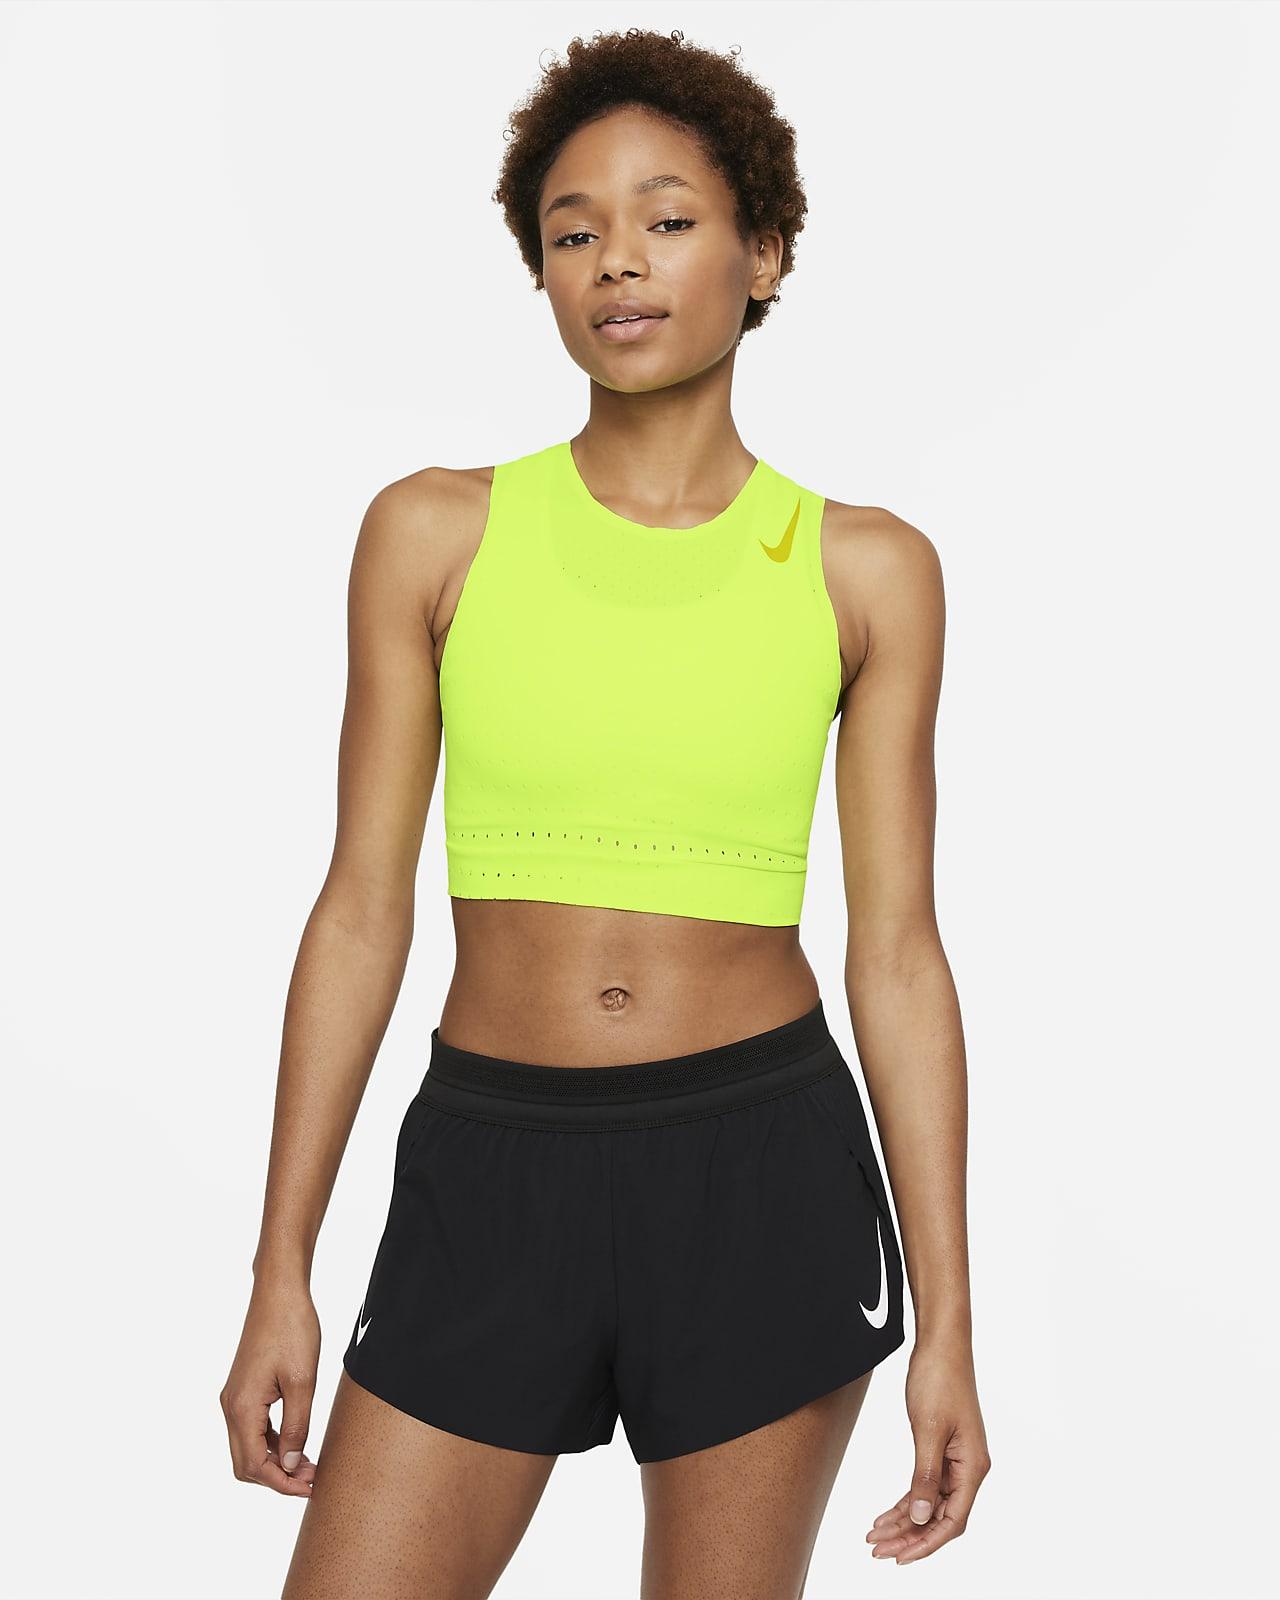 Женская укороченная майка для бега Nike Aeroswift